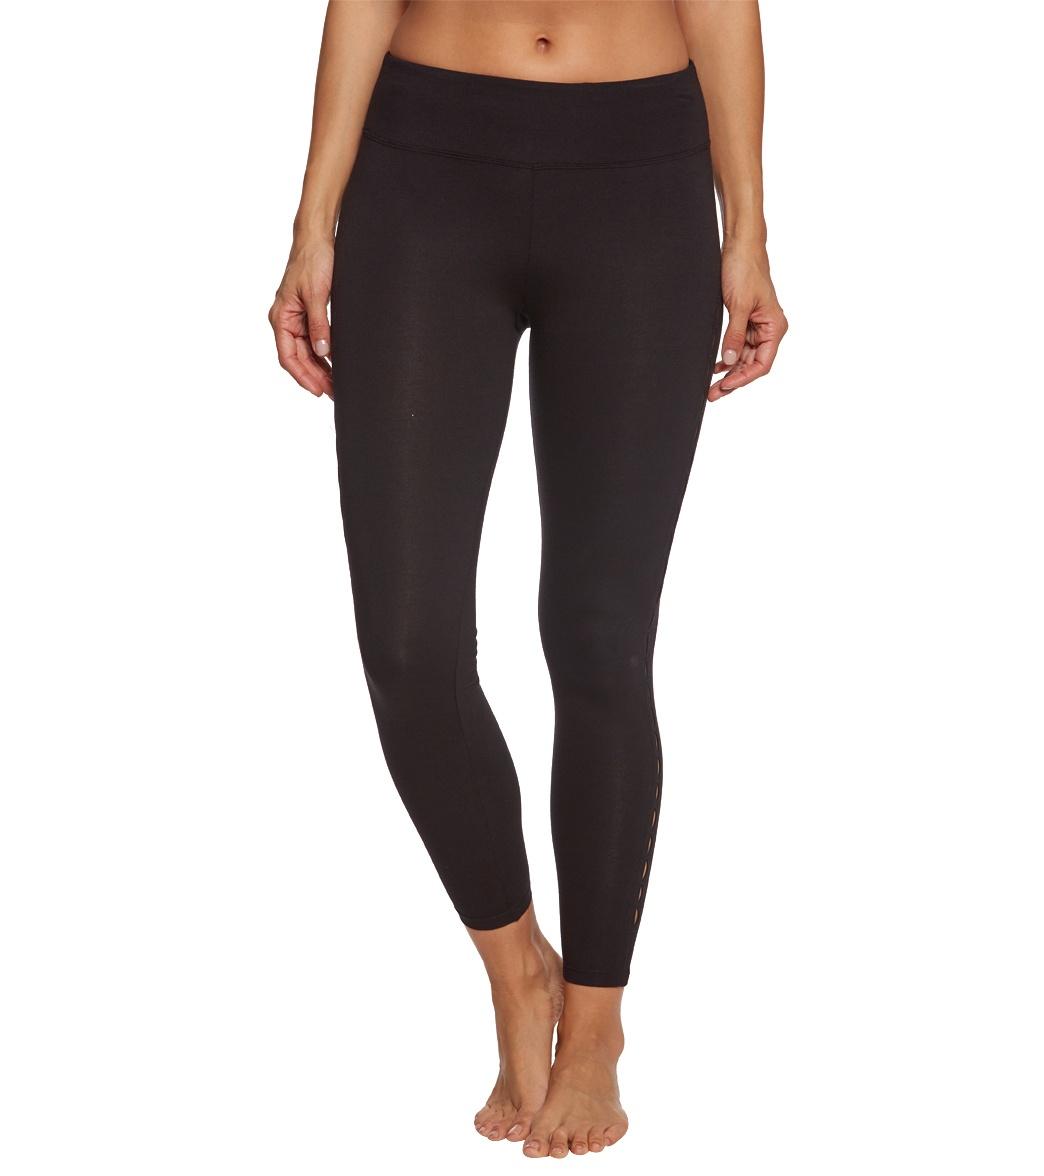 f3773e9de41ce0 Betsey Johnson Infinity Loop Thigh Cutout Cotton Yoga Leggings at ...